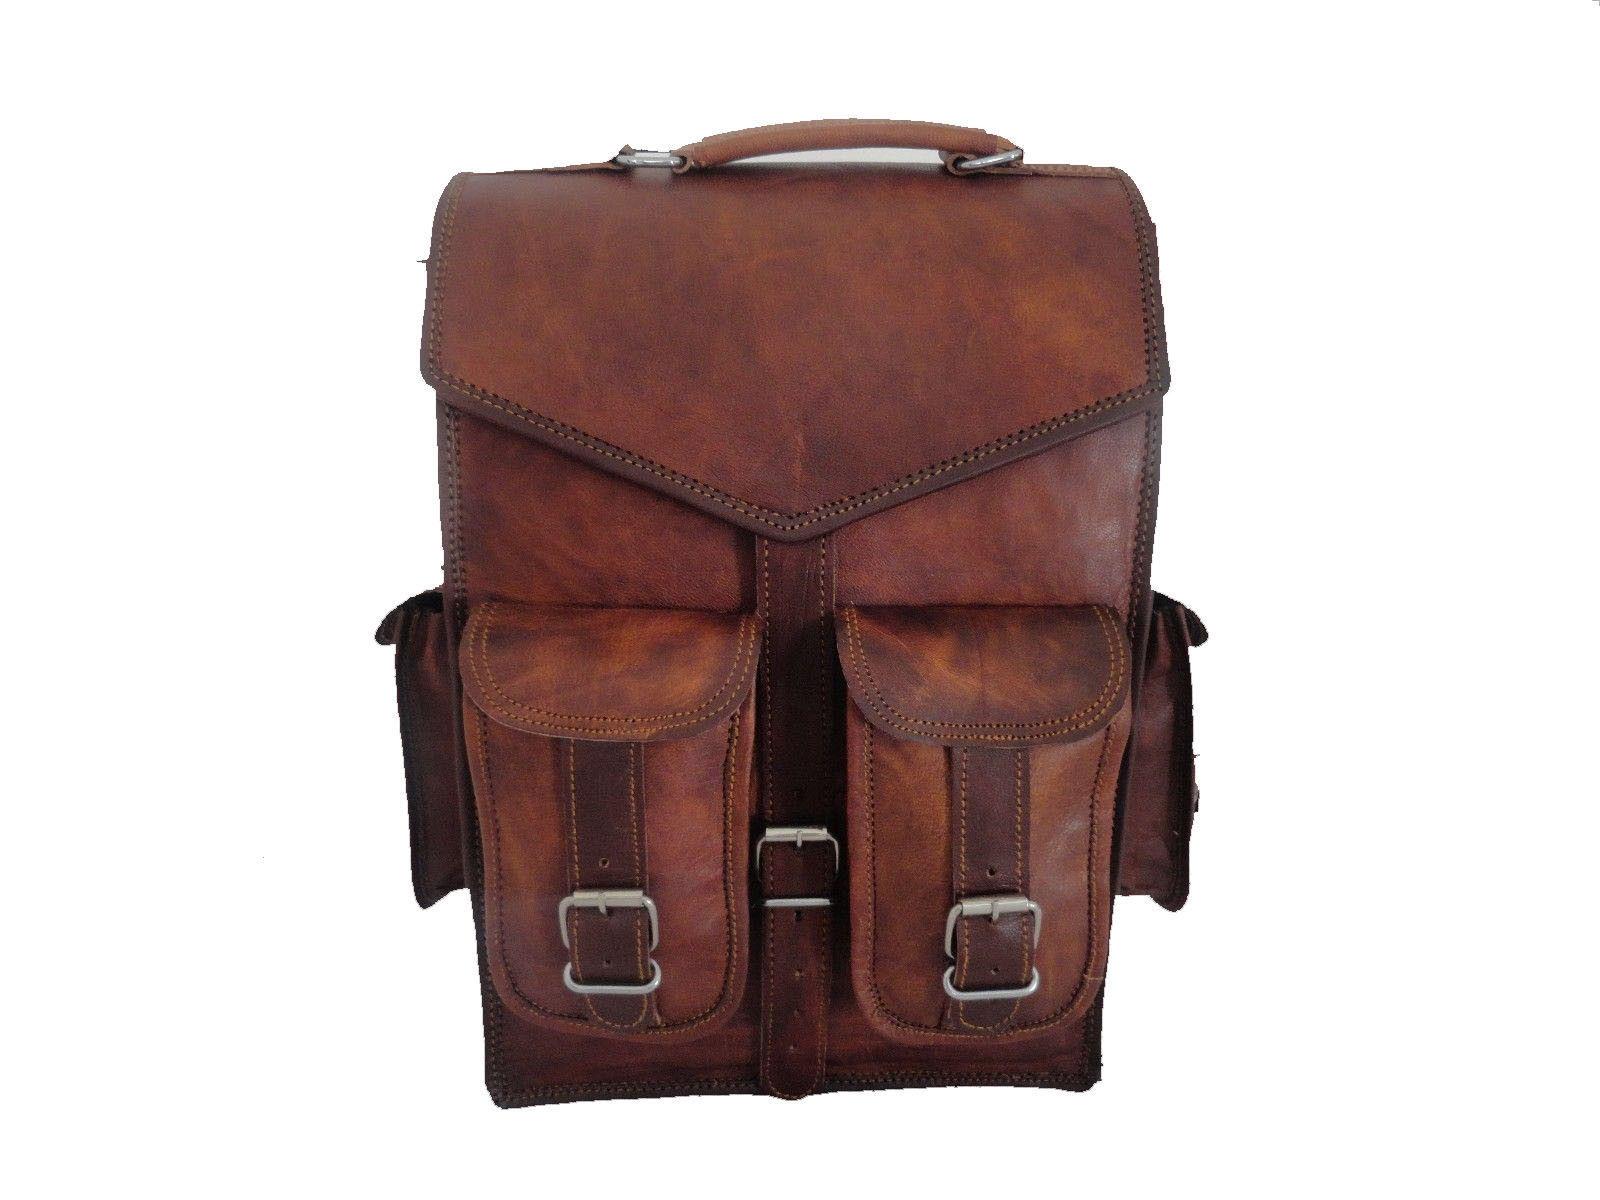 Men's vintage Leather backpack rucksack bag laptop casual travel school bags image 2